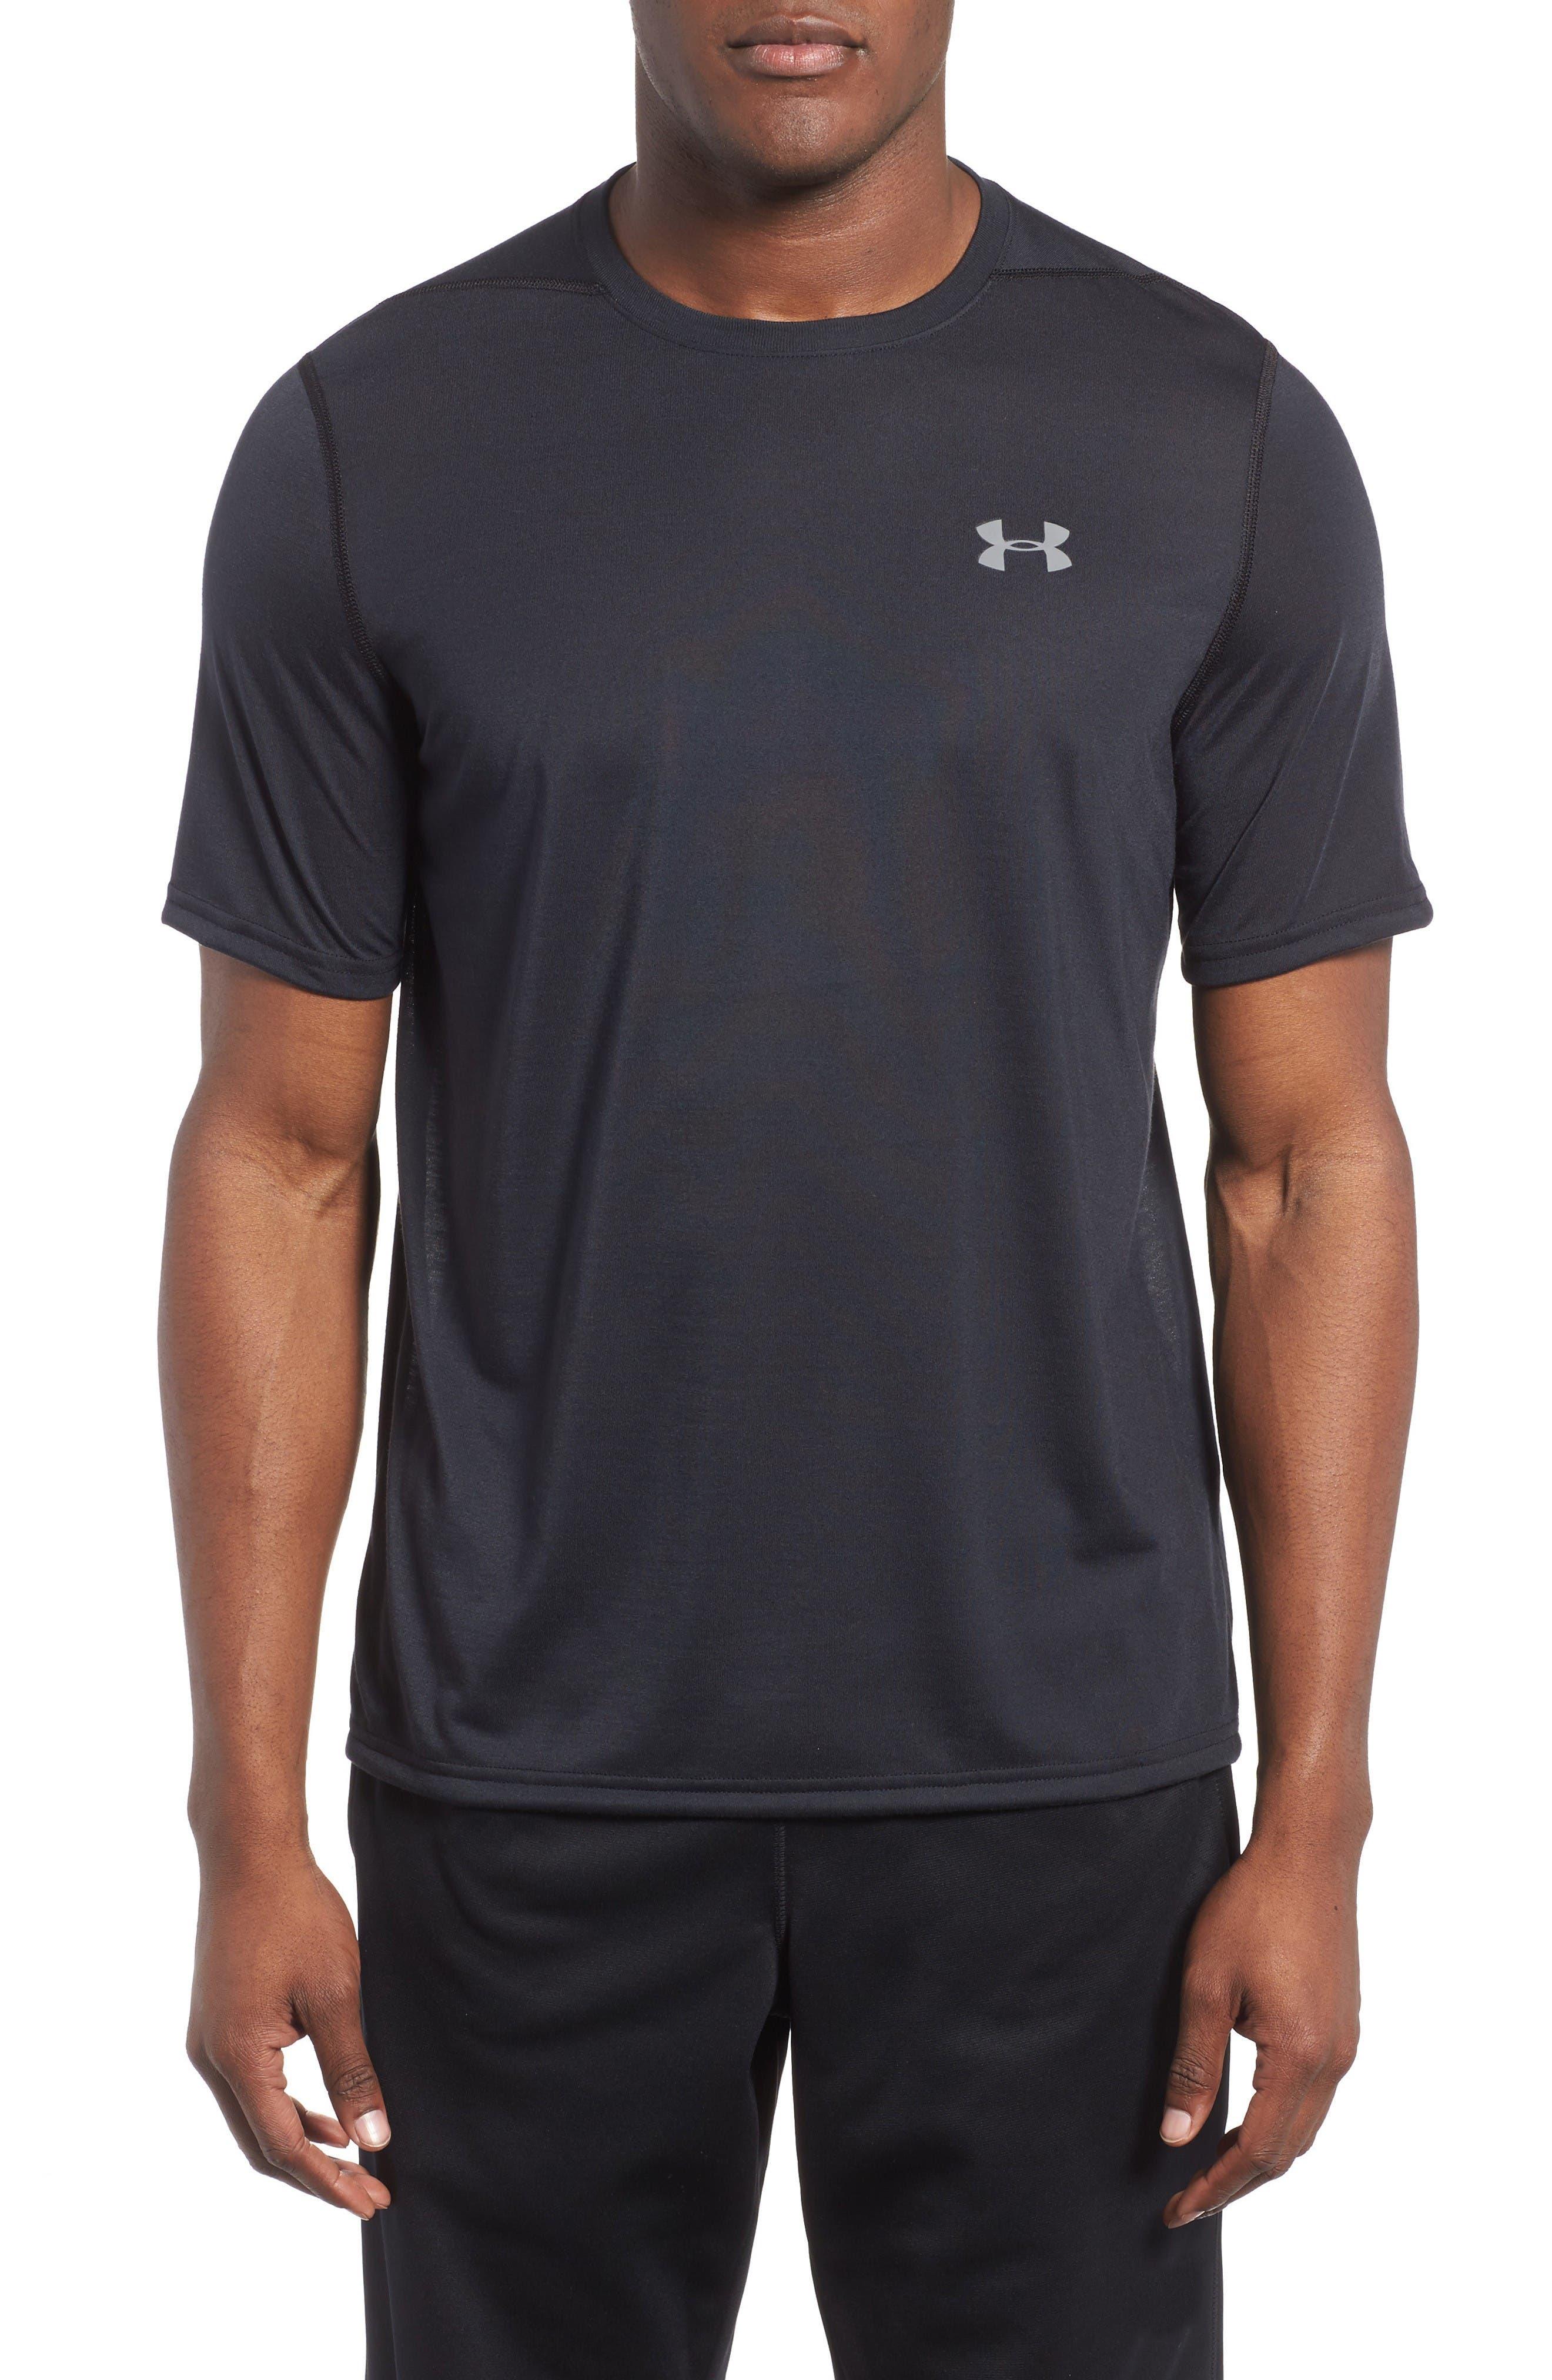 UNDER ARMOUR Regular Fit Threadborne T-Shirt in Black